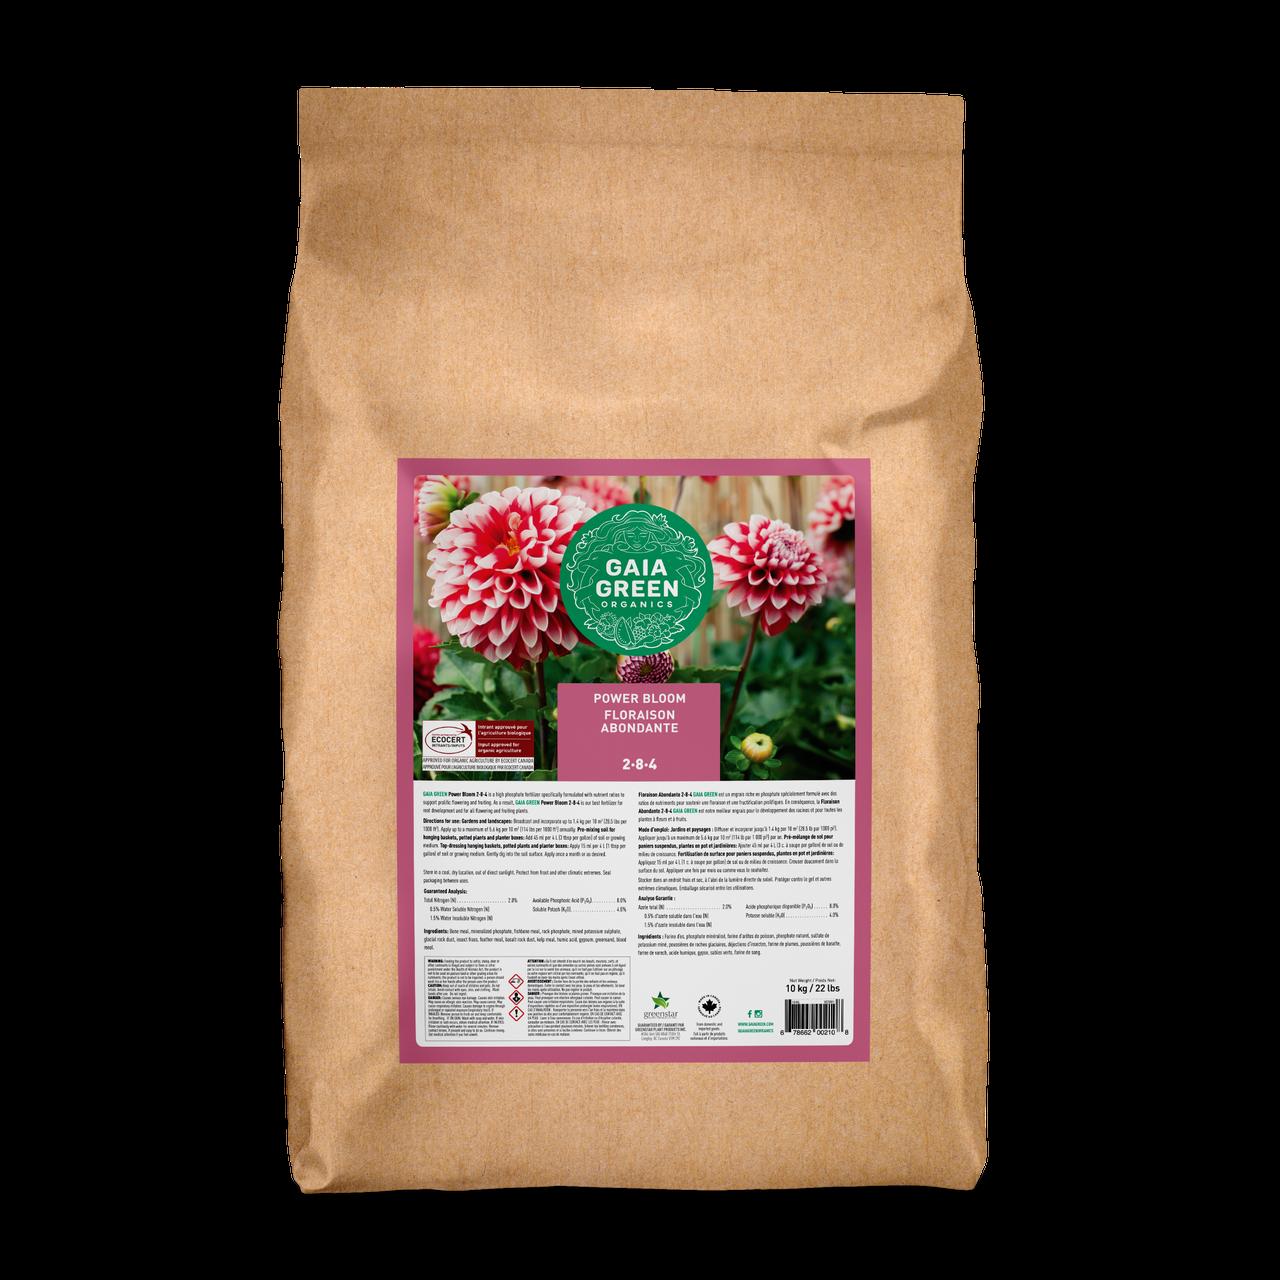 GAIA GREEN Organics - Power Bloom